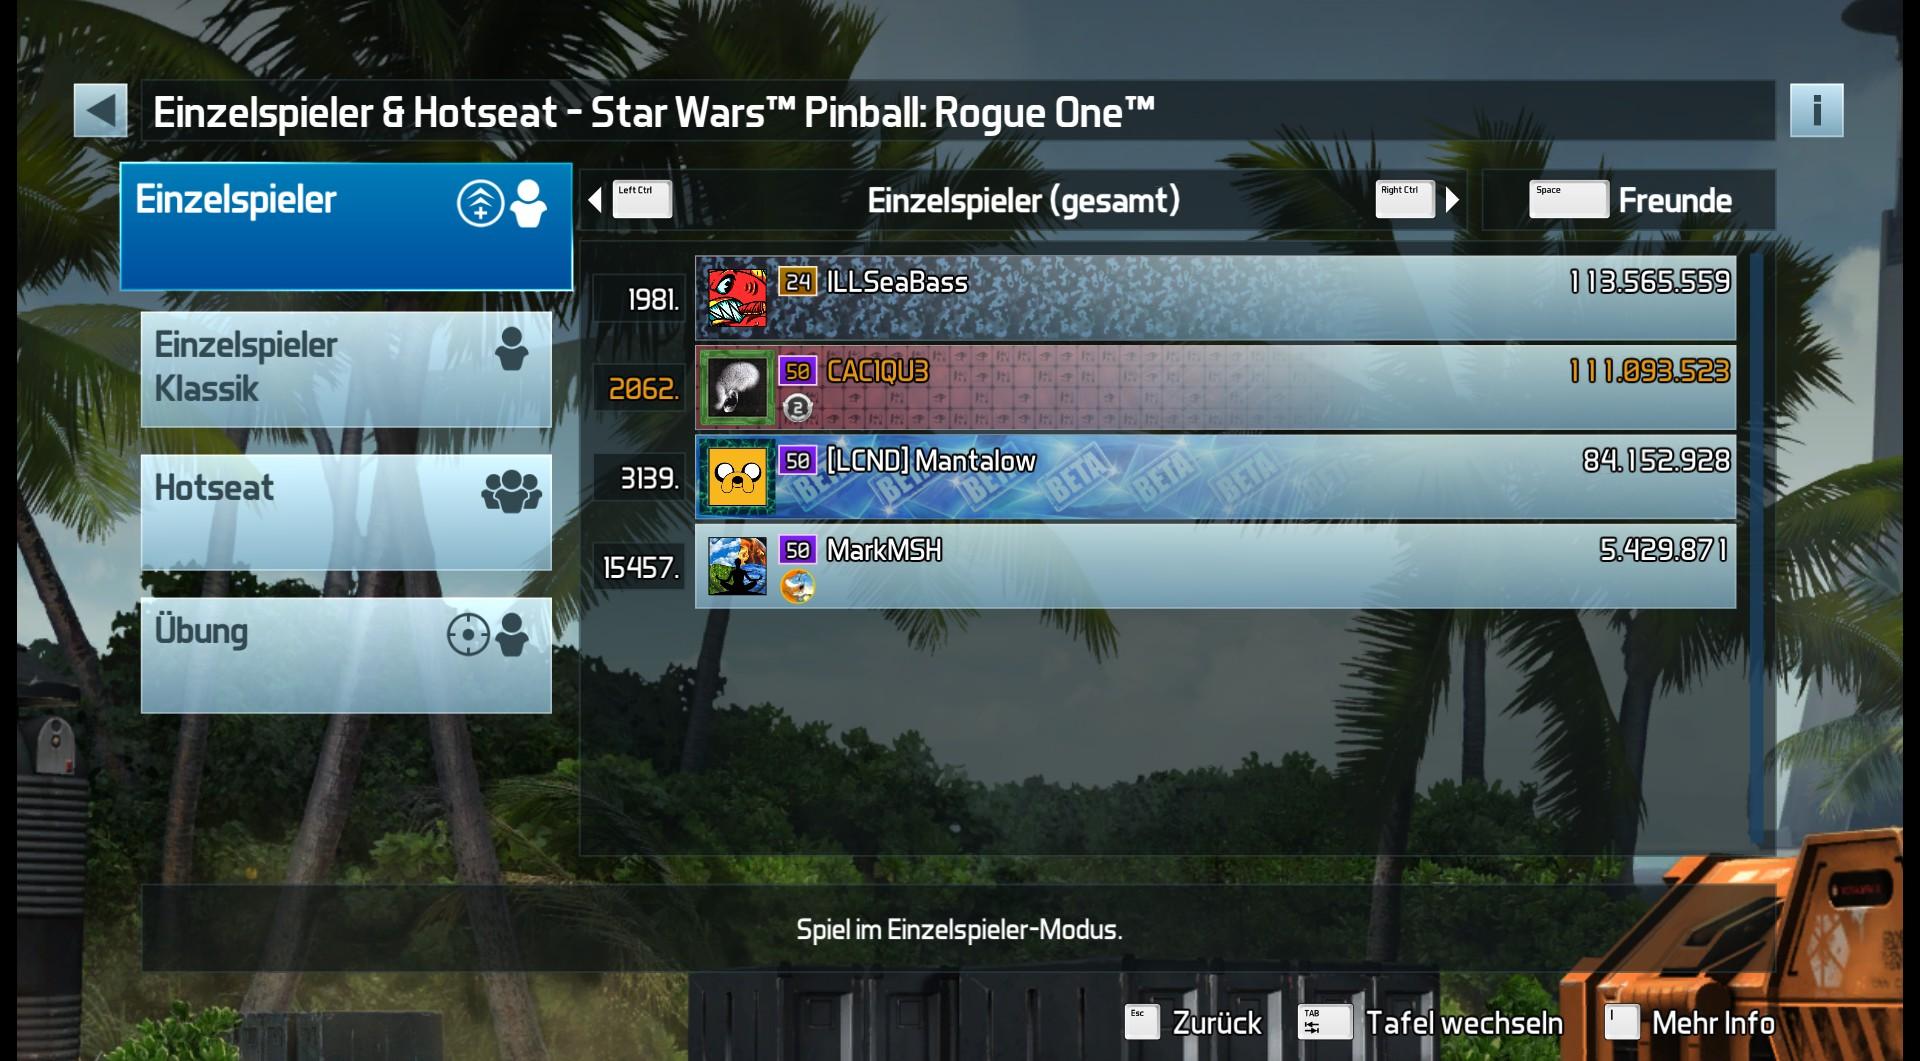 CAC1QU3: Pinball FX3: Star Wars Pinball: Rogue One (PC) 111,093,523 points on 2019-04-21 18:36:42